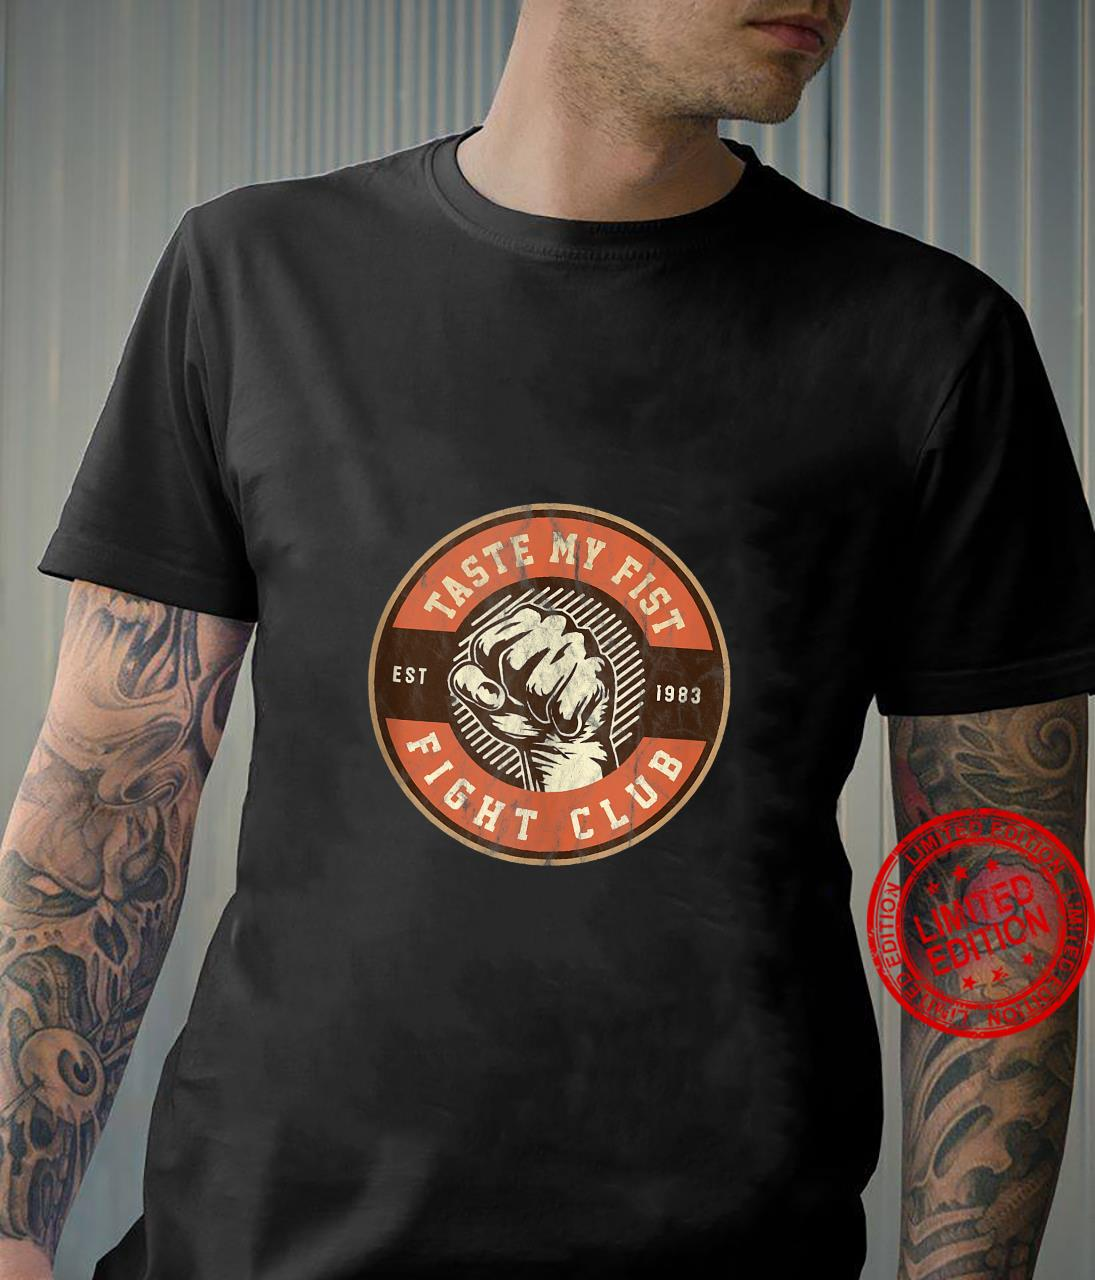 Taste My Fist Fighting Club Fighter Retro Vintage Fight Shirt